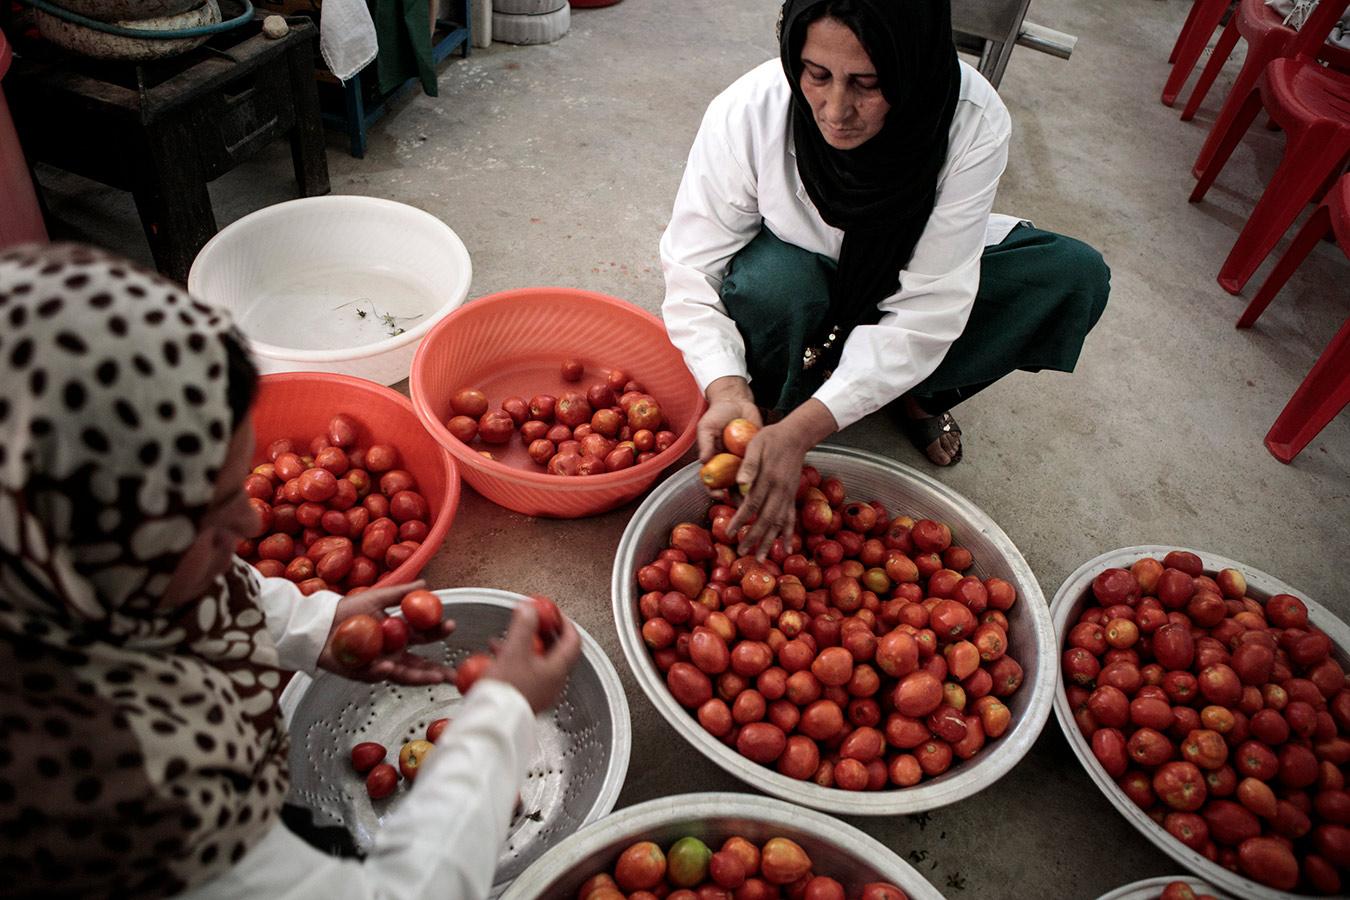 afghanistan-weat-photoslideshow-2-03052020.jpg